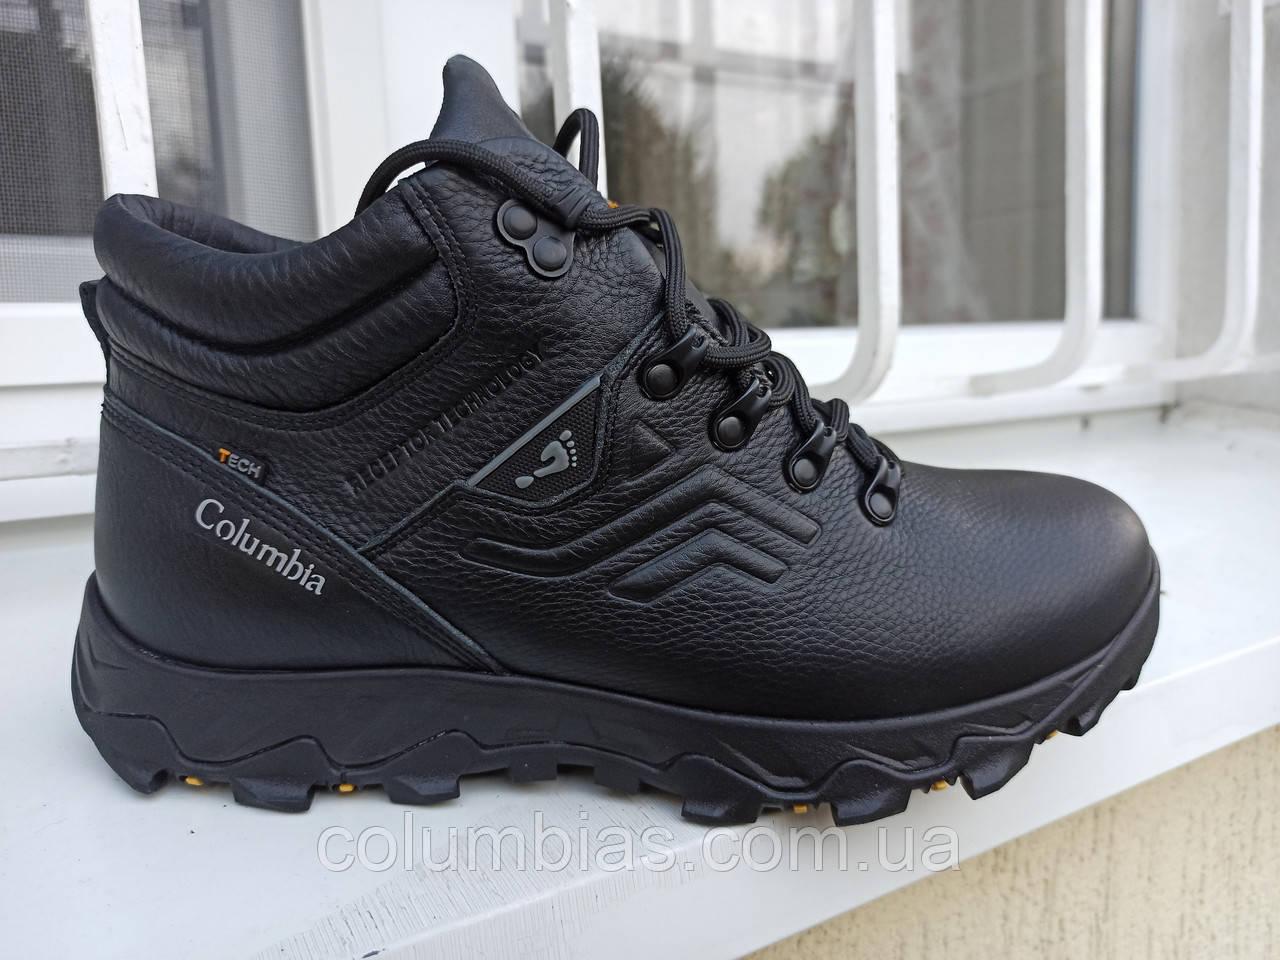 Зимние кожаные ботинки columbia termo